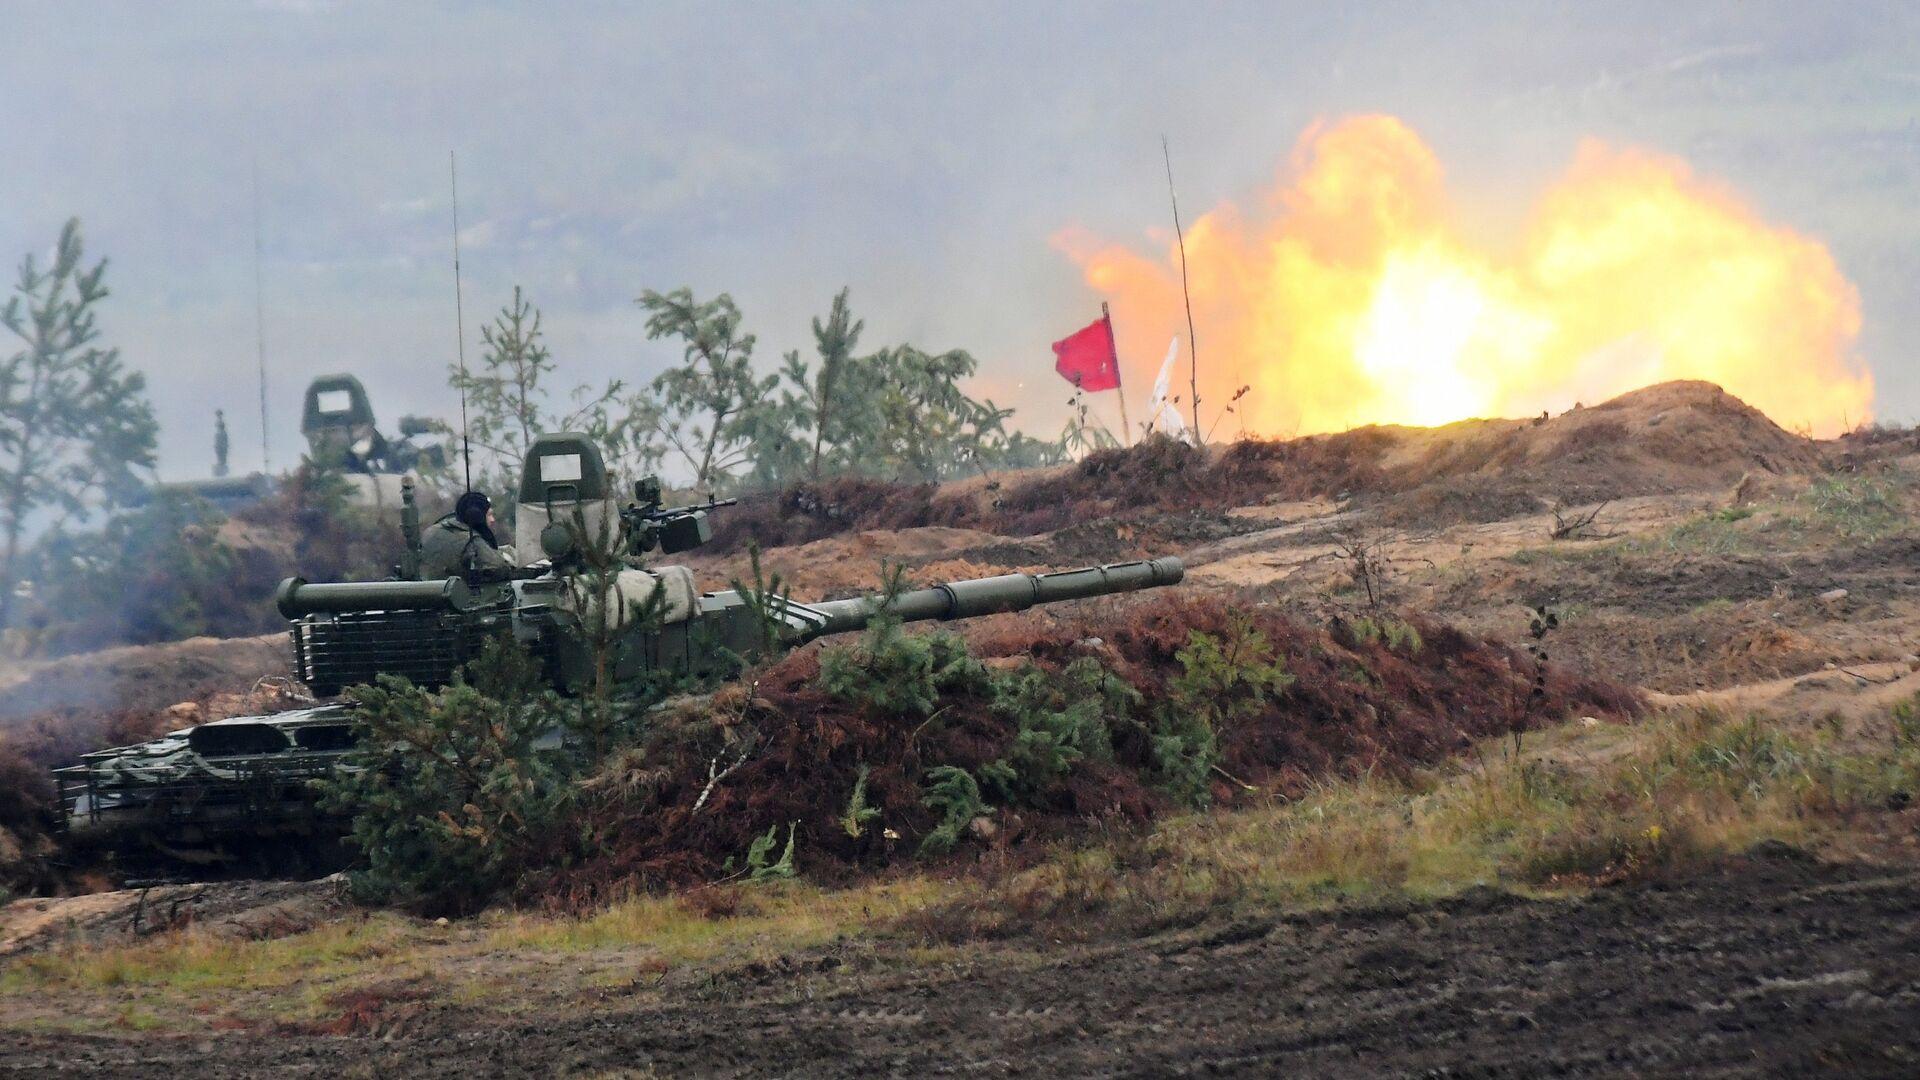 Танк Т-72Б3 во время учений Запад-2017 - РИА Новости, 1920, 21.12.2020